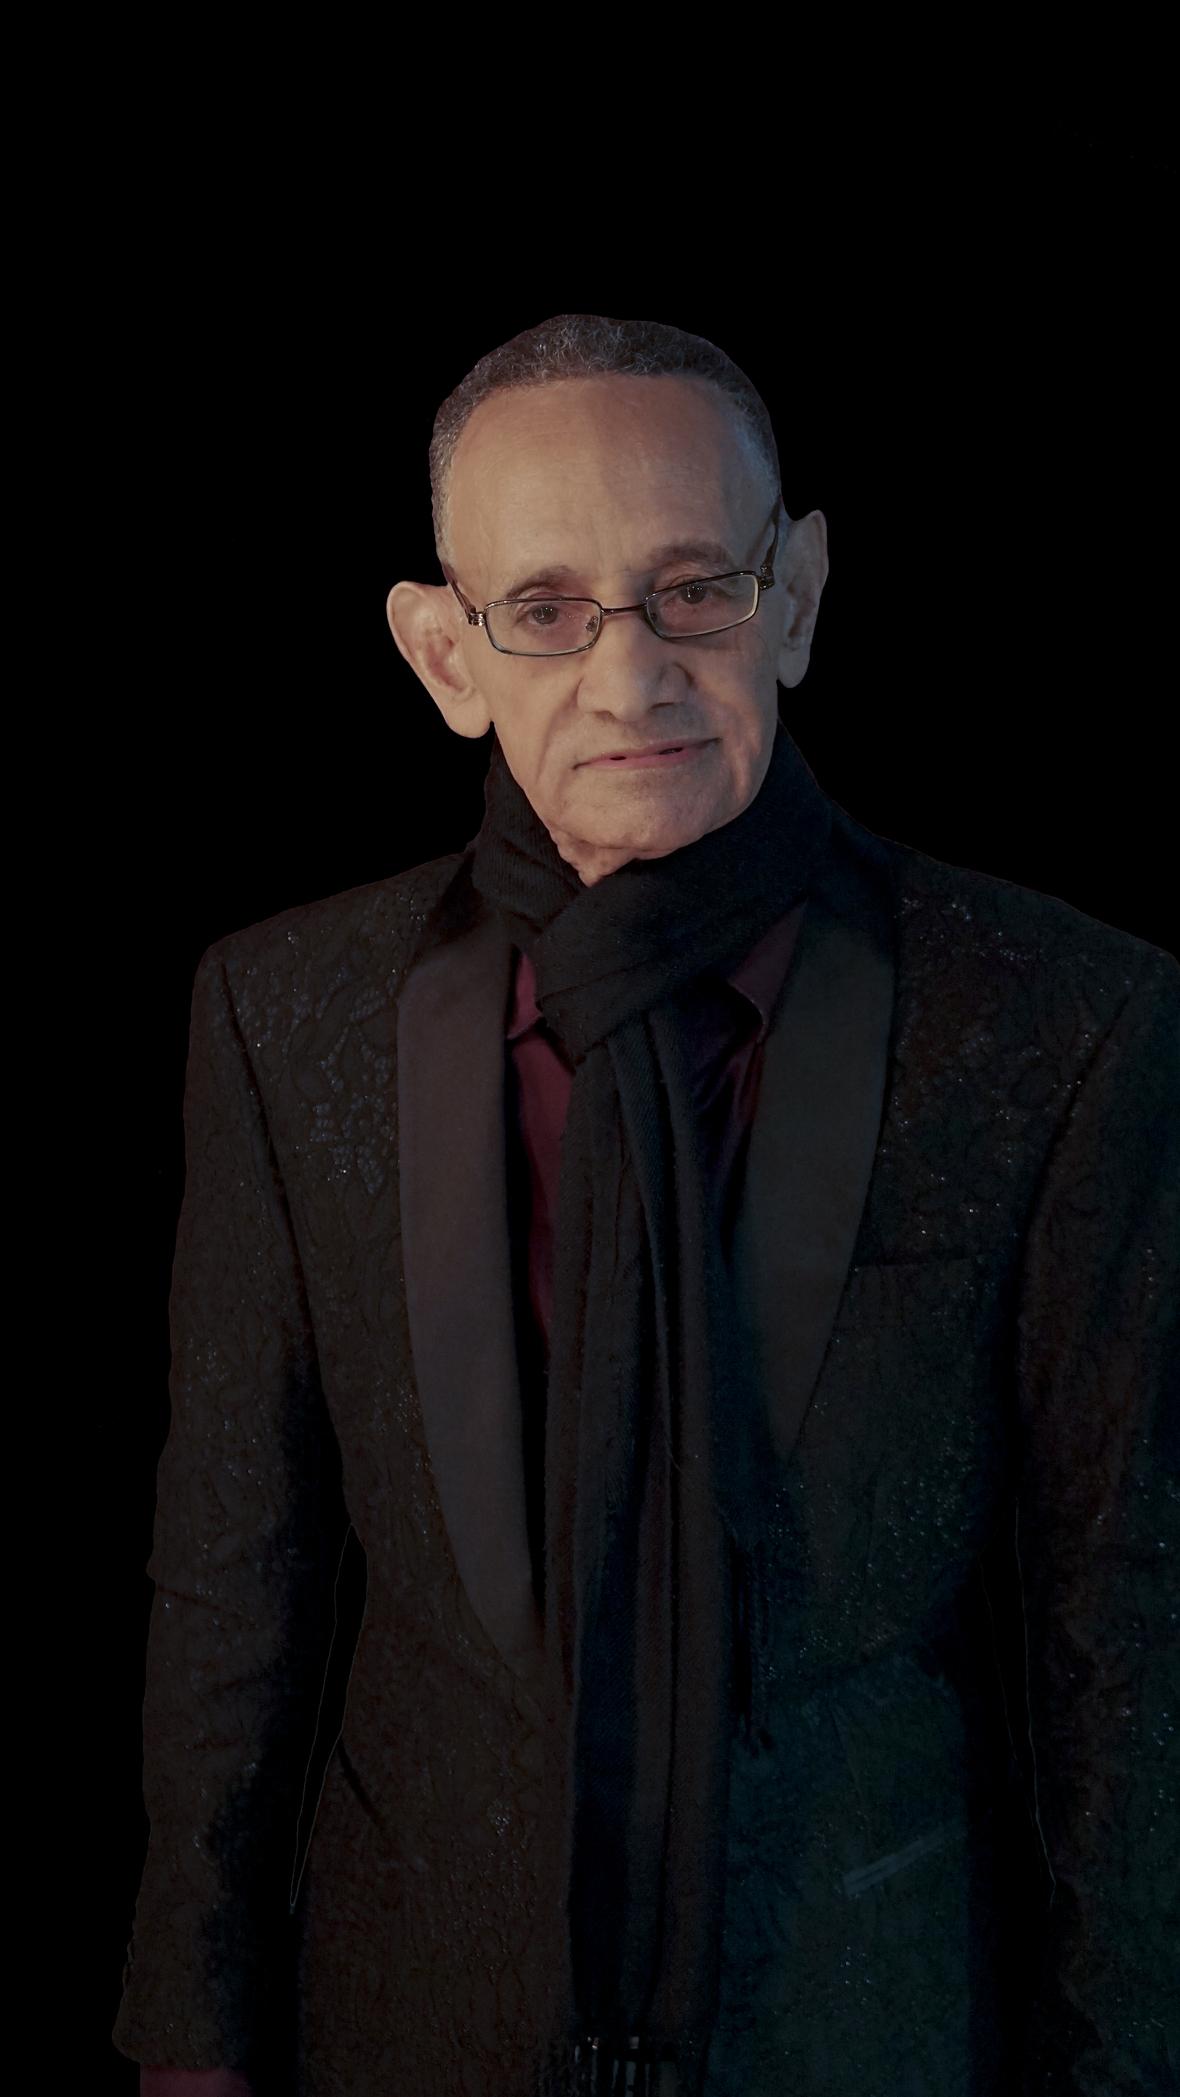 Luis Segura 3 Foto Oficiales